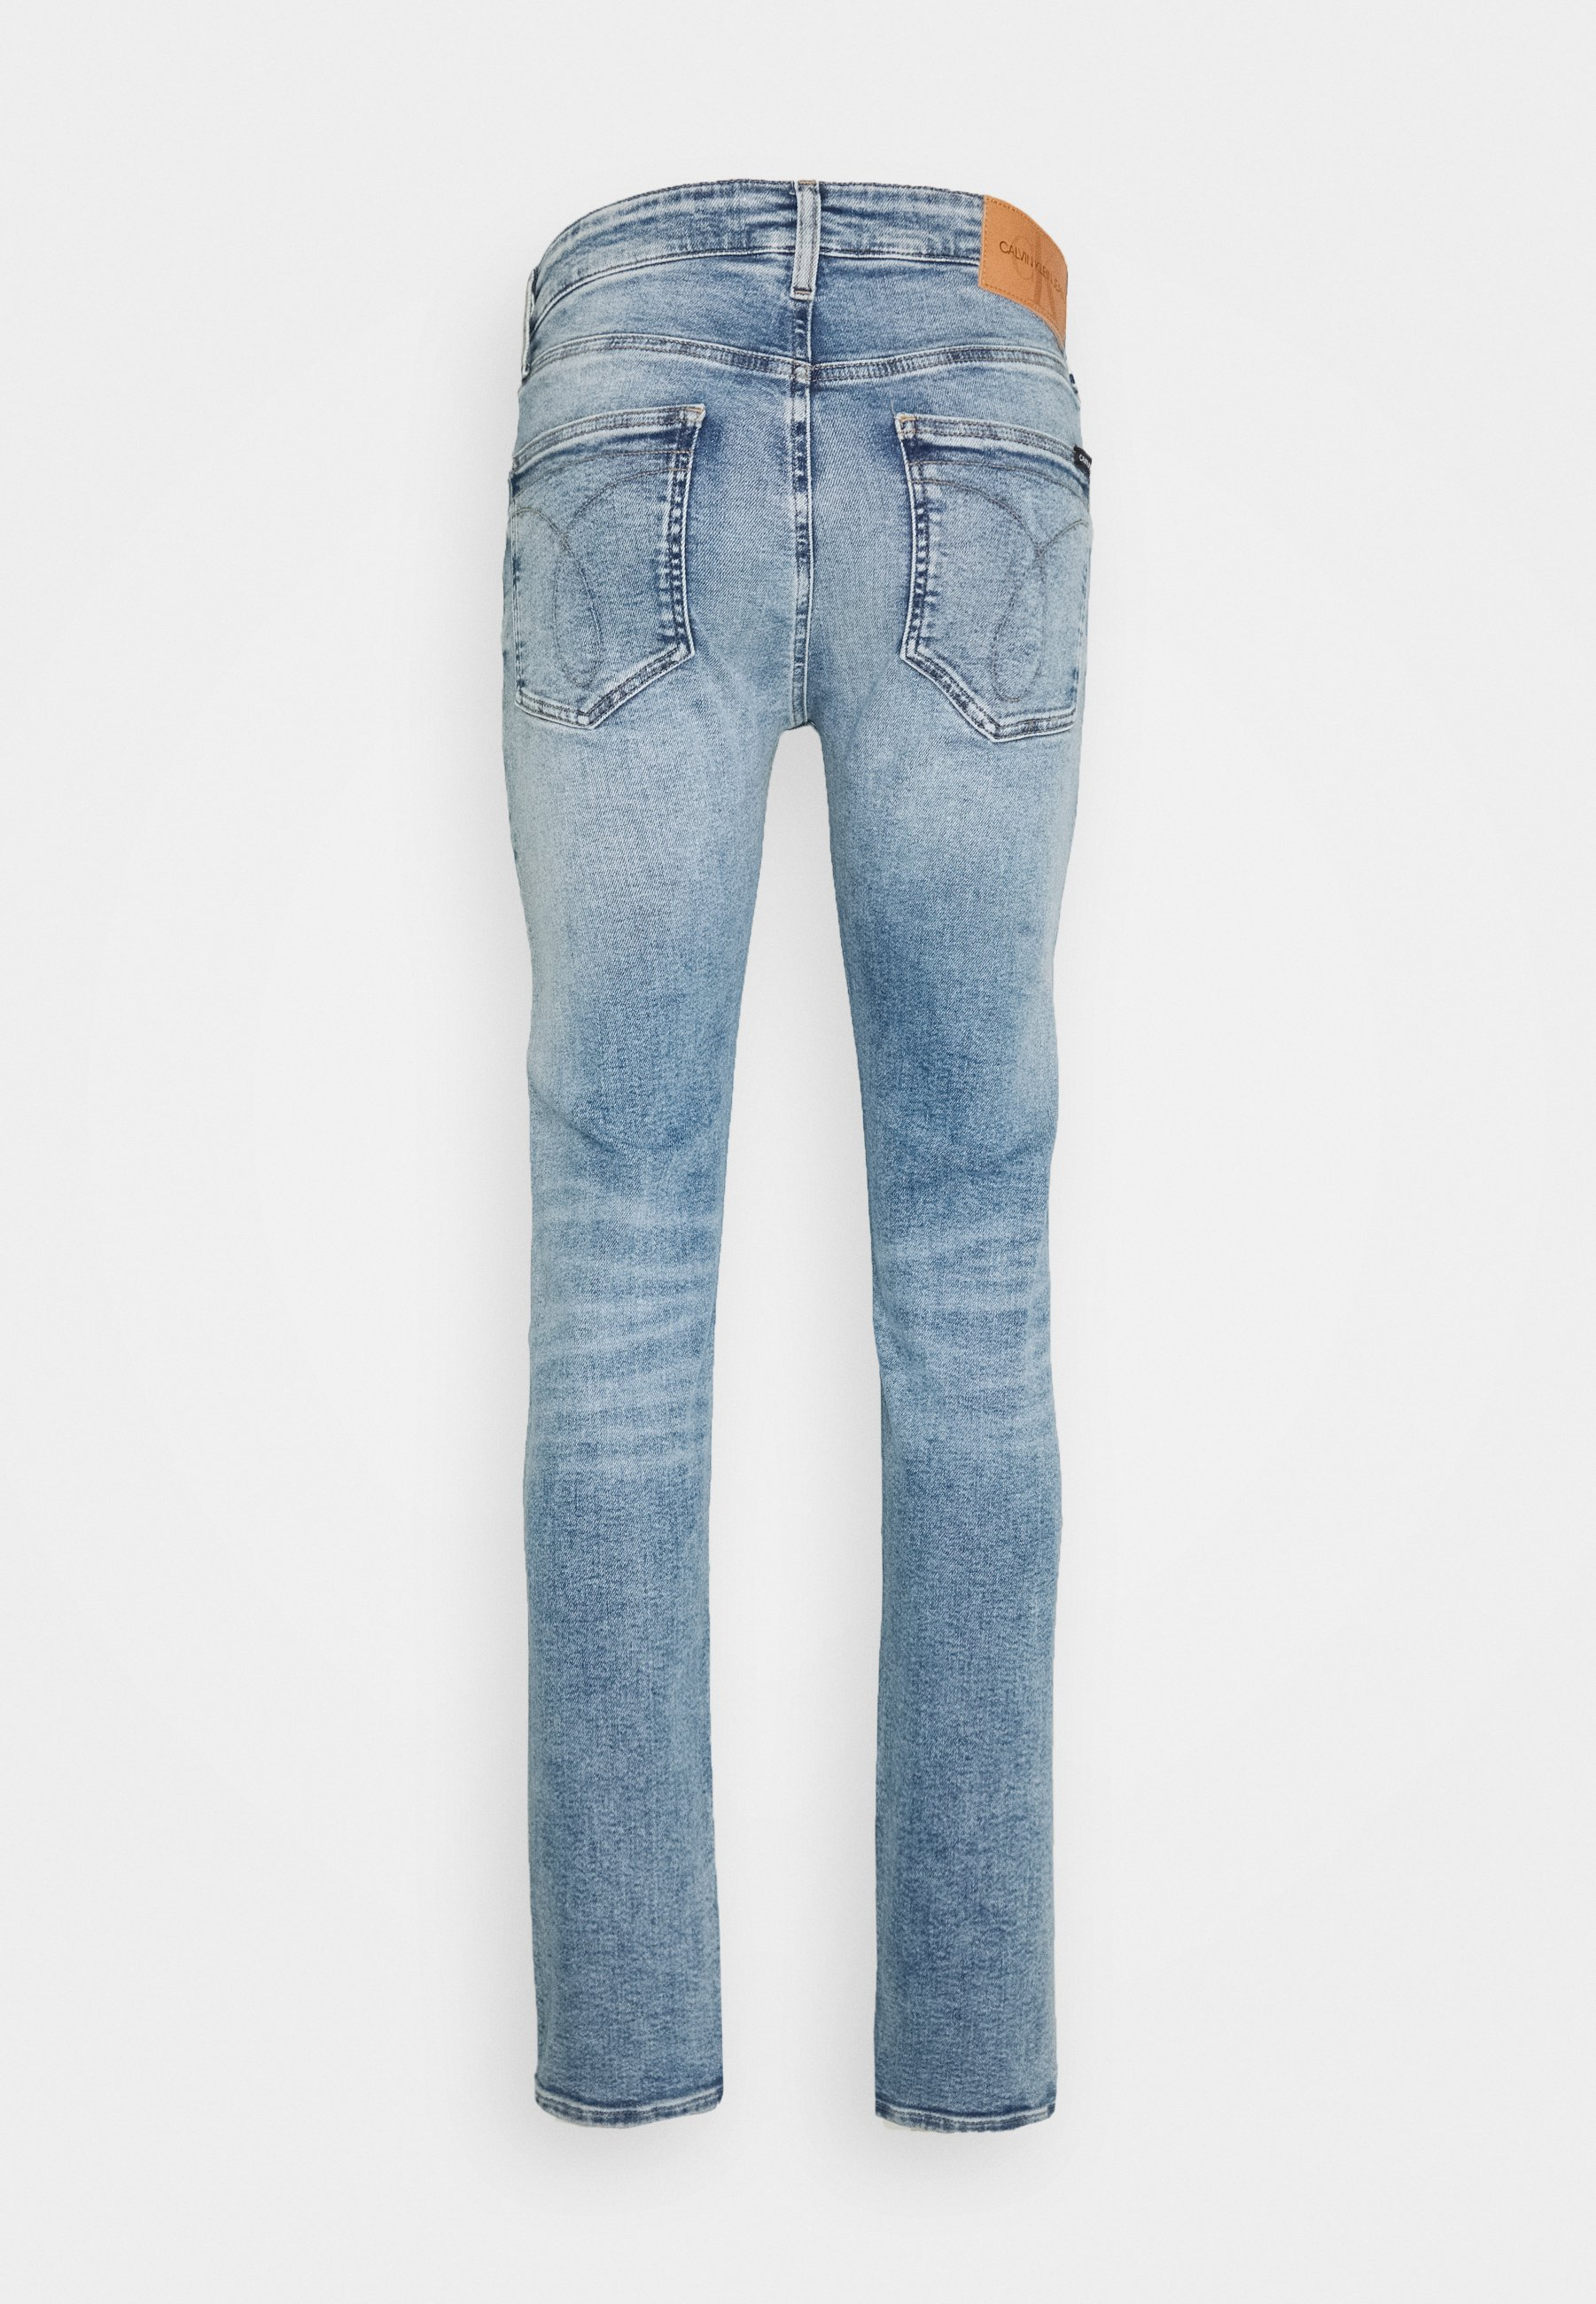 Calvin Klein Jeans Skinny - Fit Light Blue